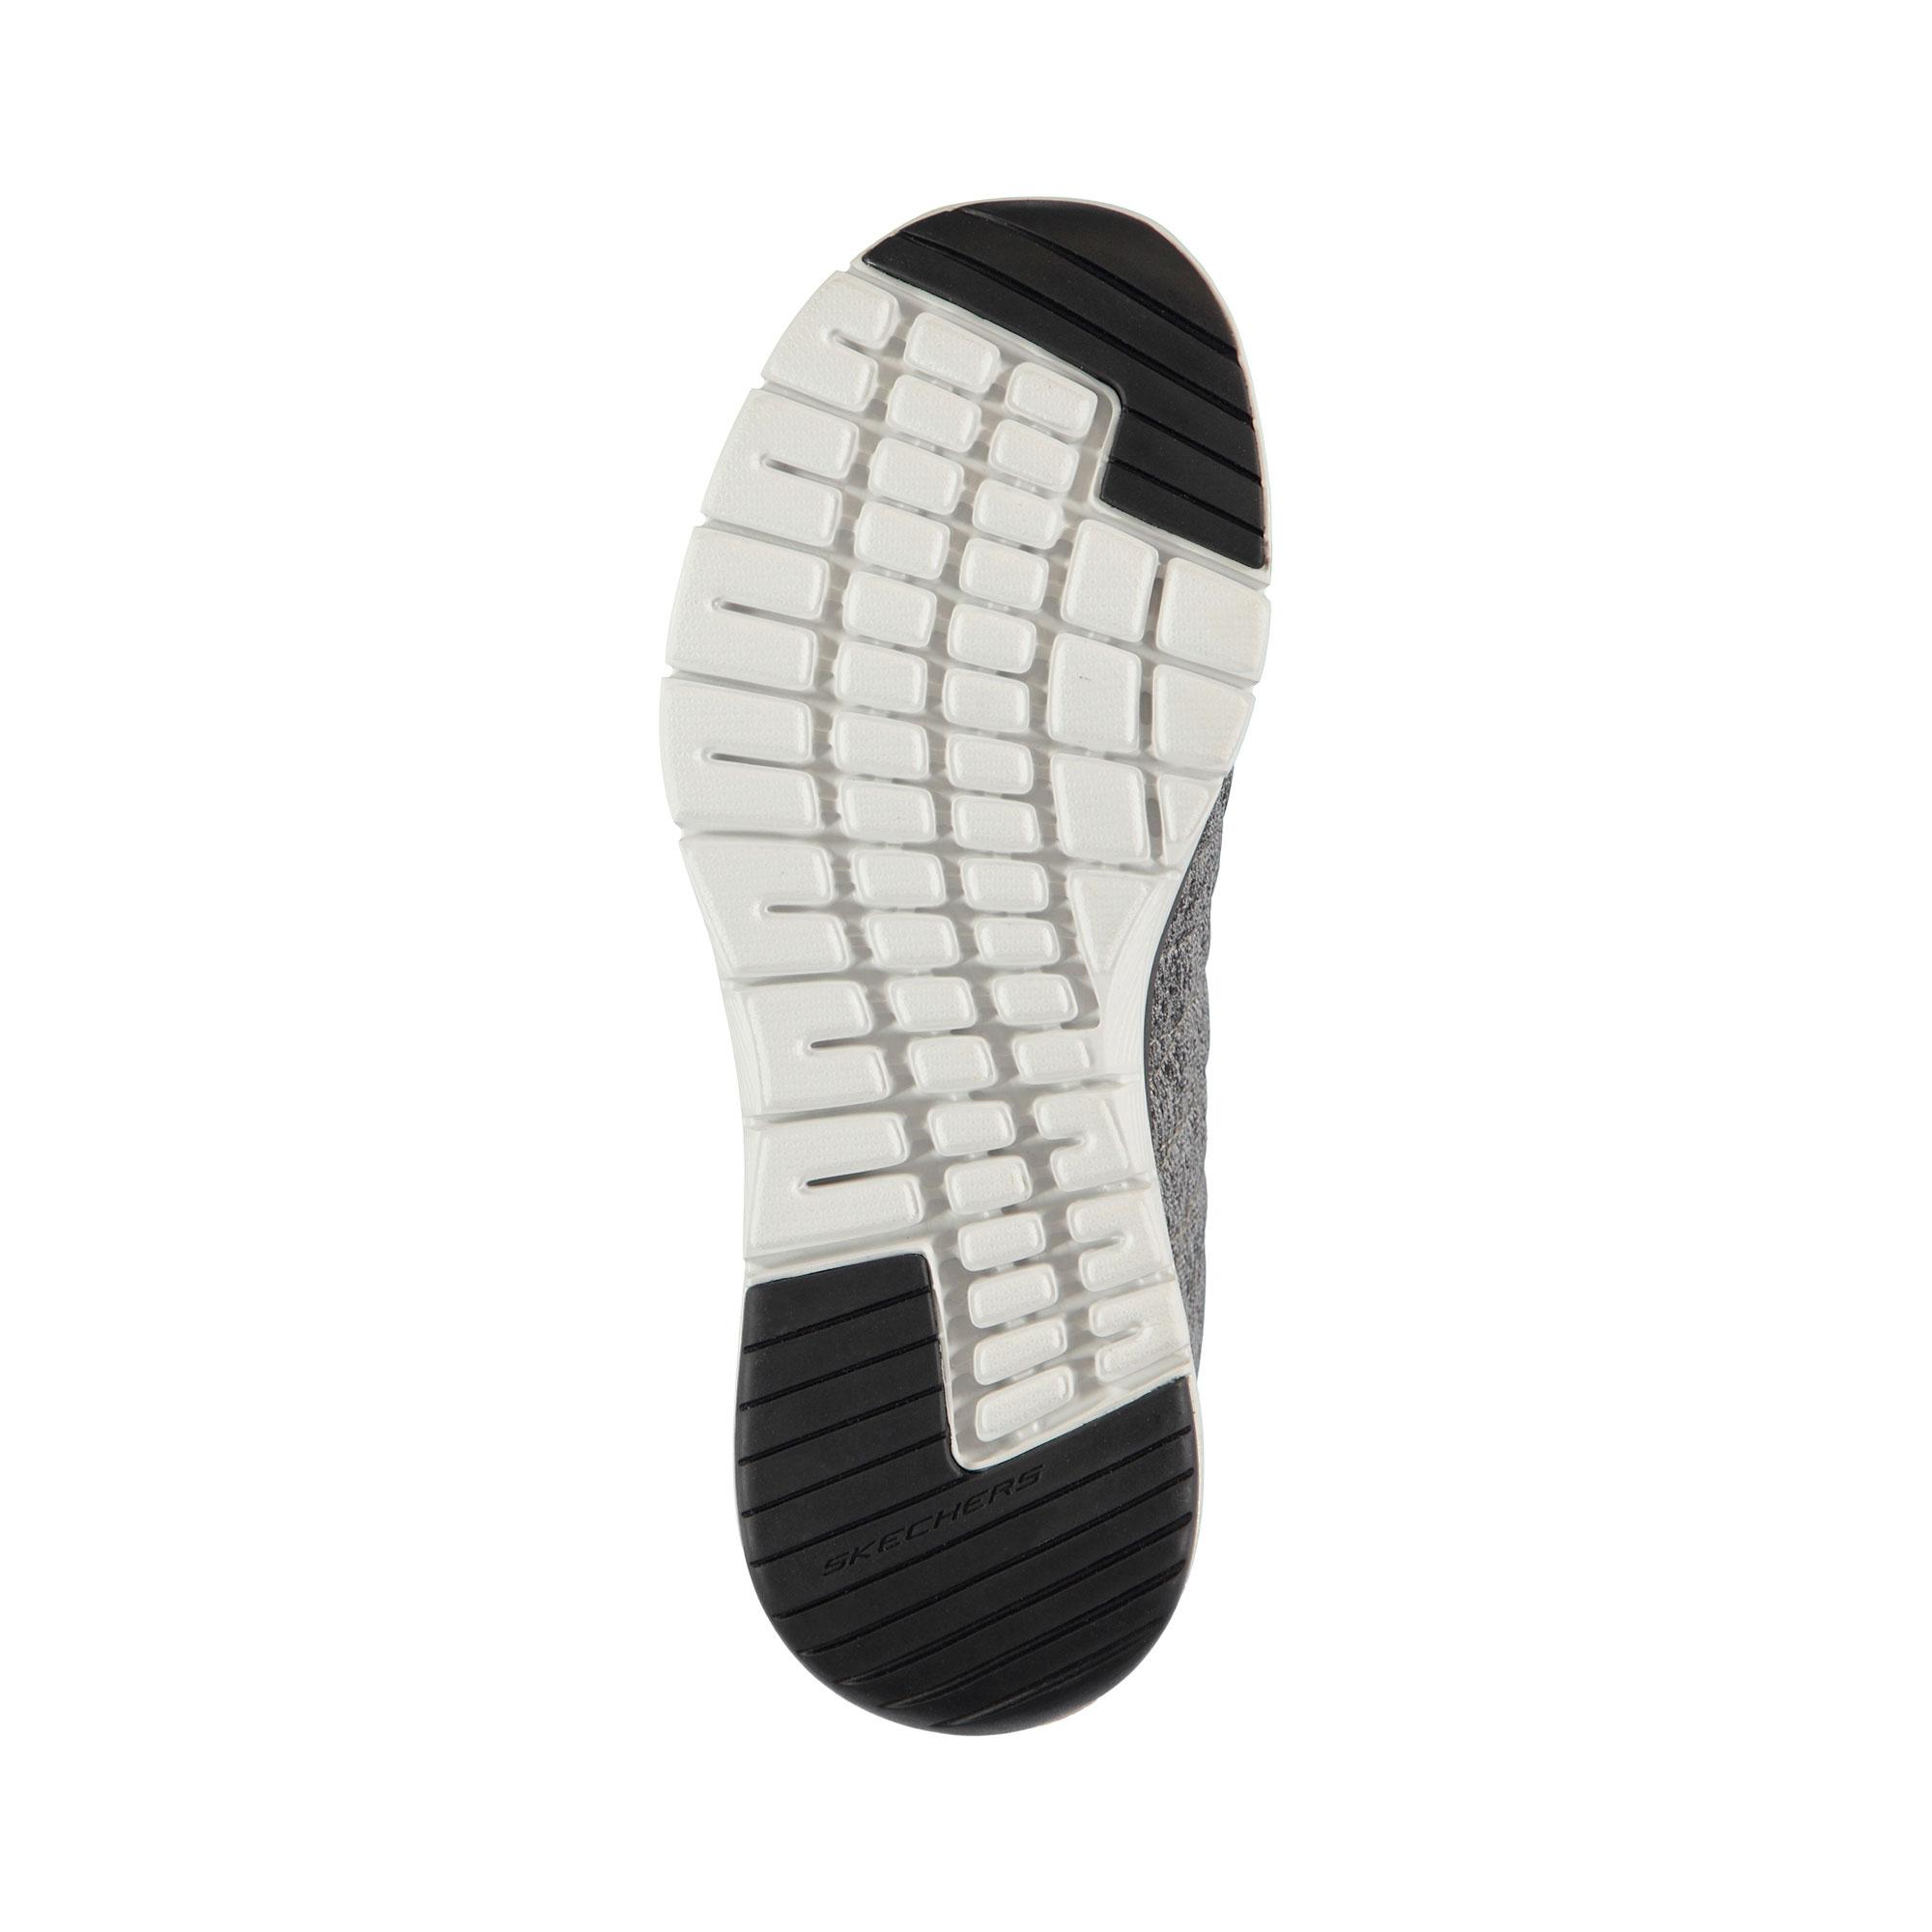 Skechers Flex Advantage 3.0- Stally Erkek Gri-Siyah Spor Ayakkabı